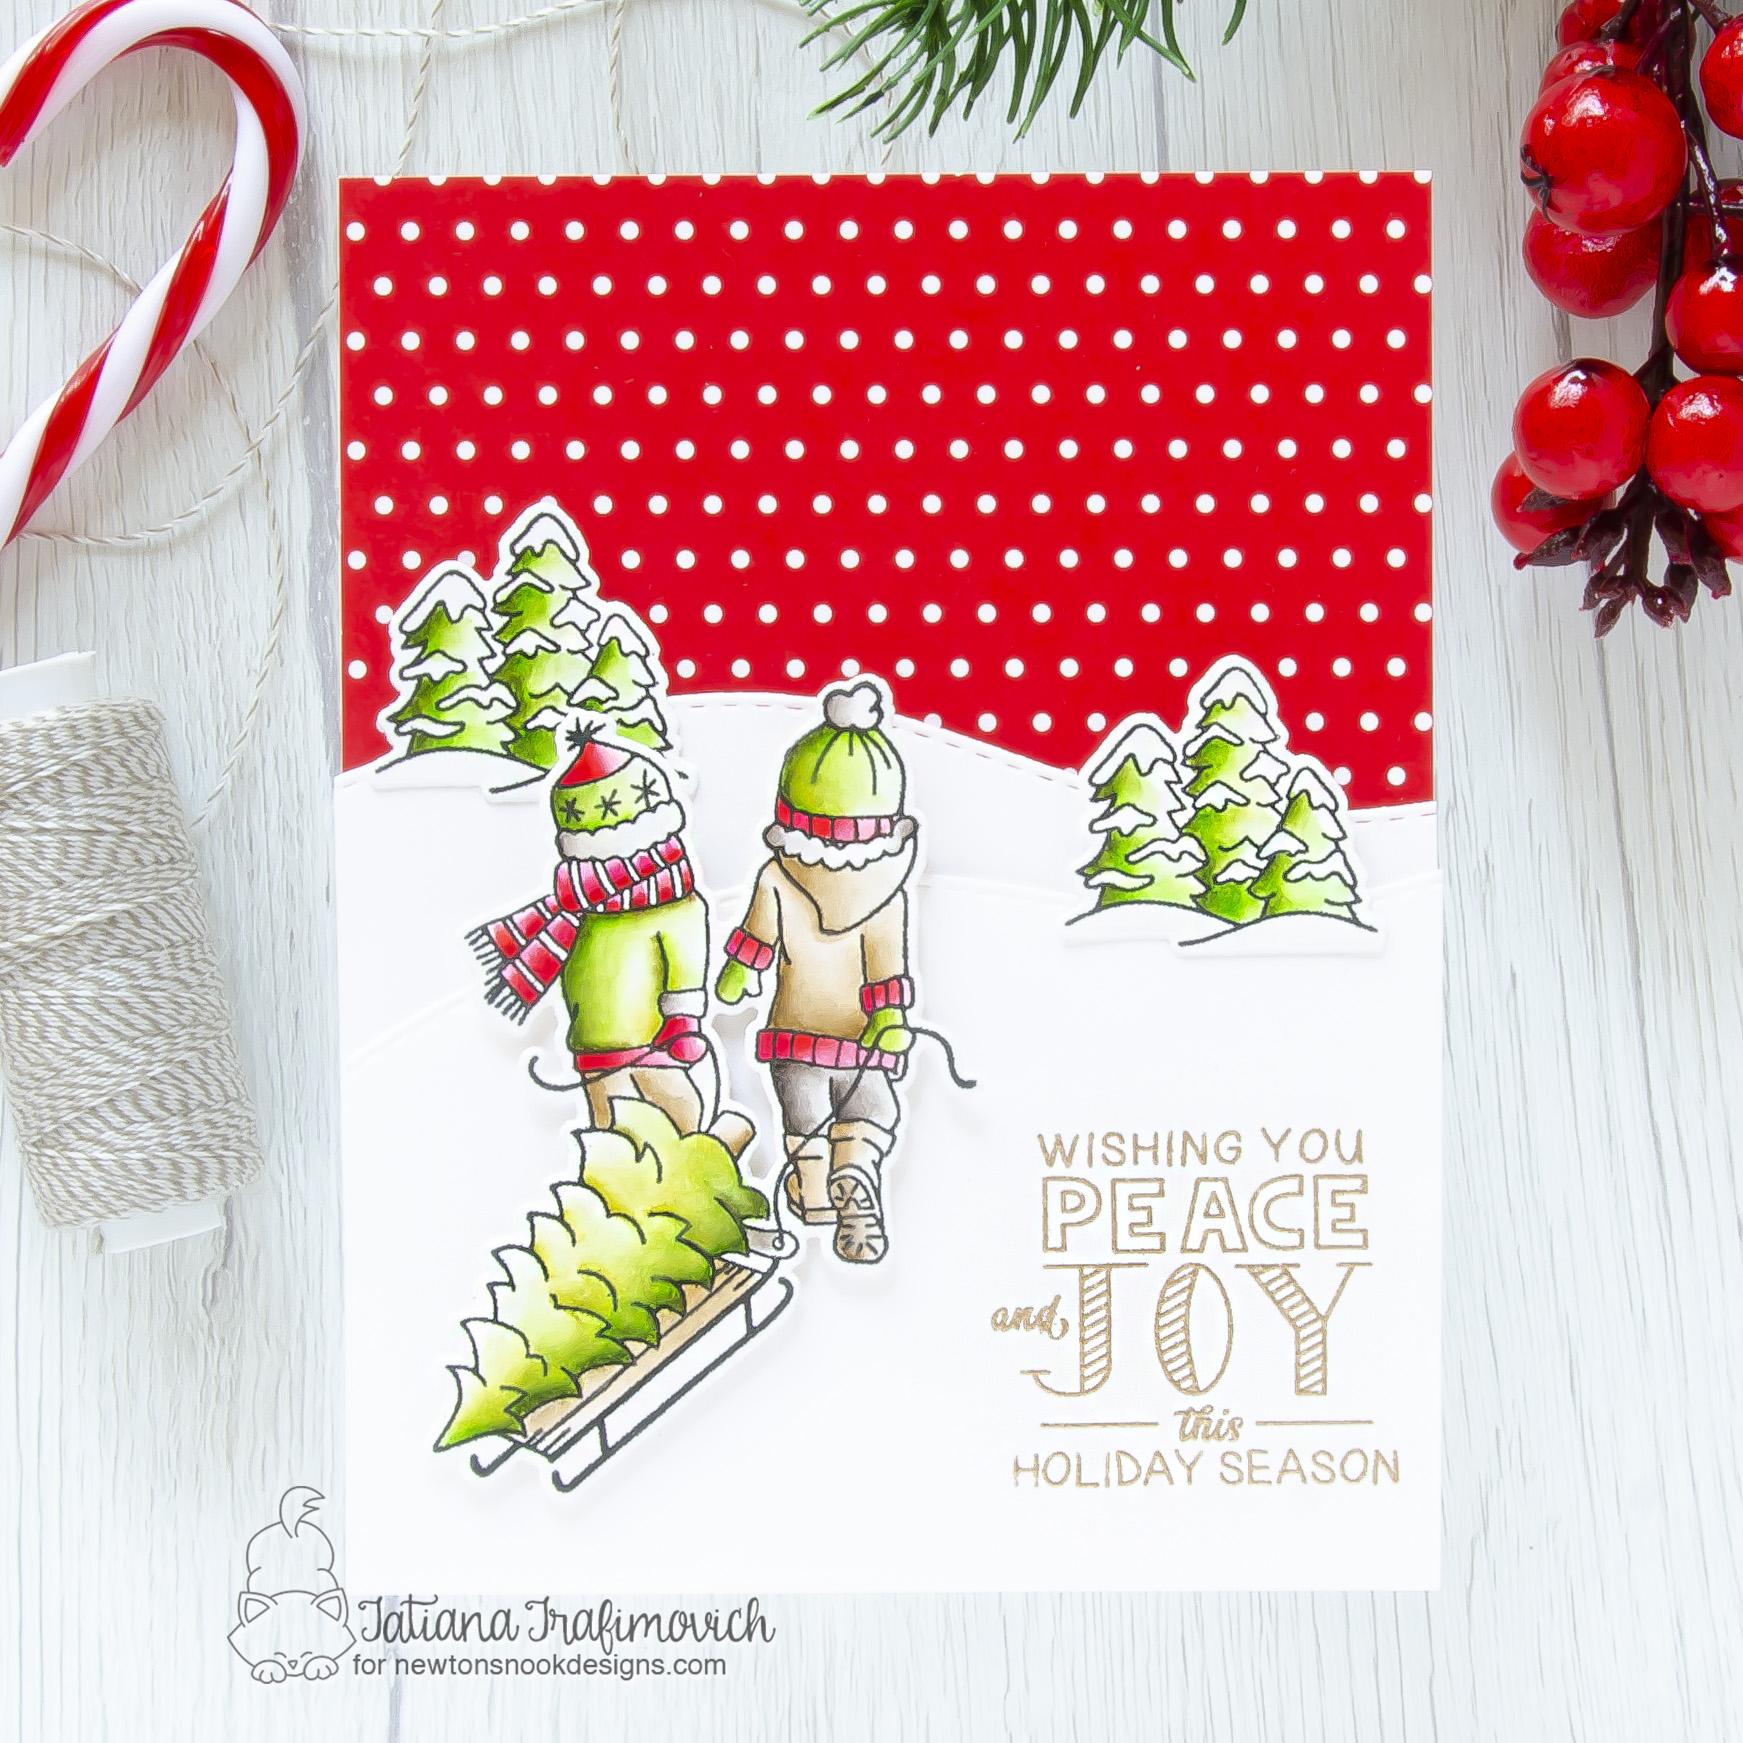 Peace & Joy #handmade card by Tatiana Trafimovich #tatianacraftandart - Holiday Home stamp set by Newton's Nook Designs #newtonsnook